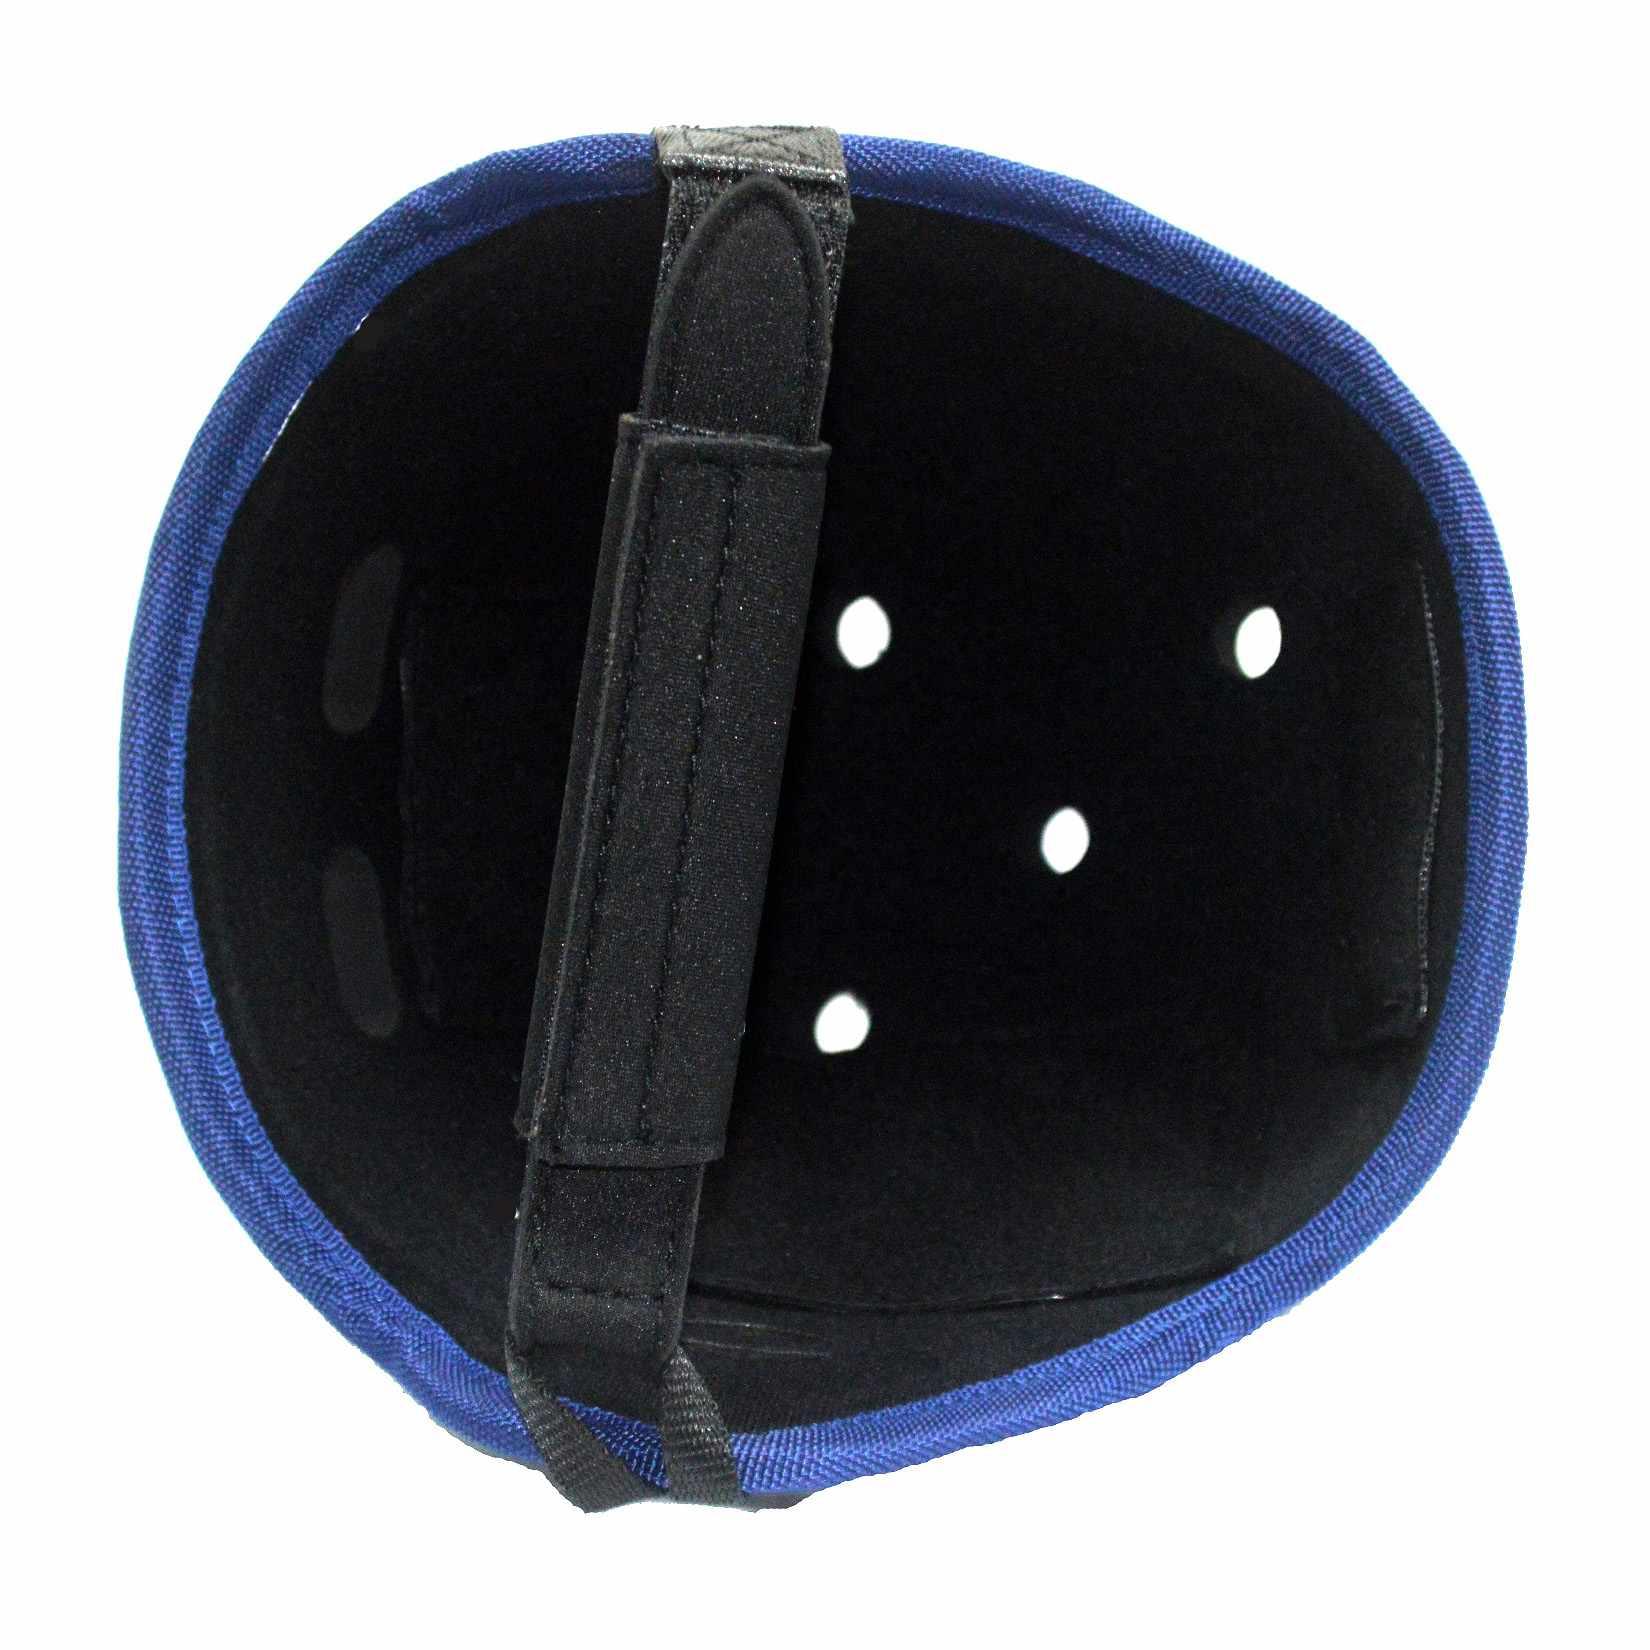 Opti-cool Headgear Eva Foam Cooling Helmet